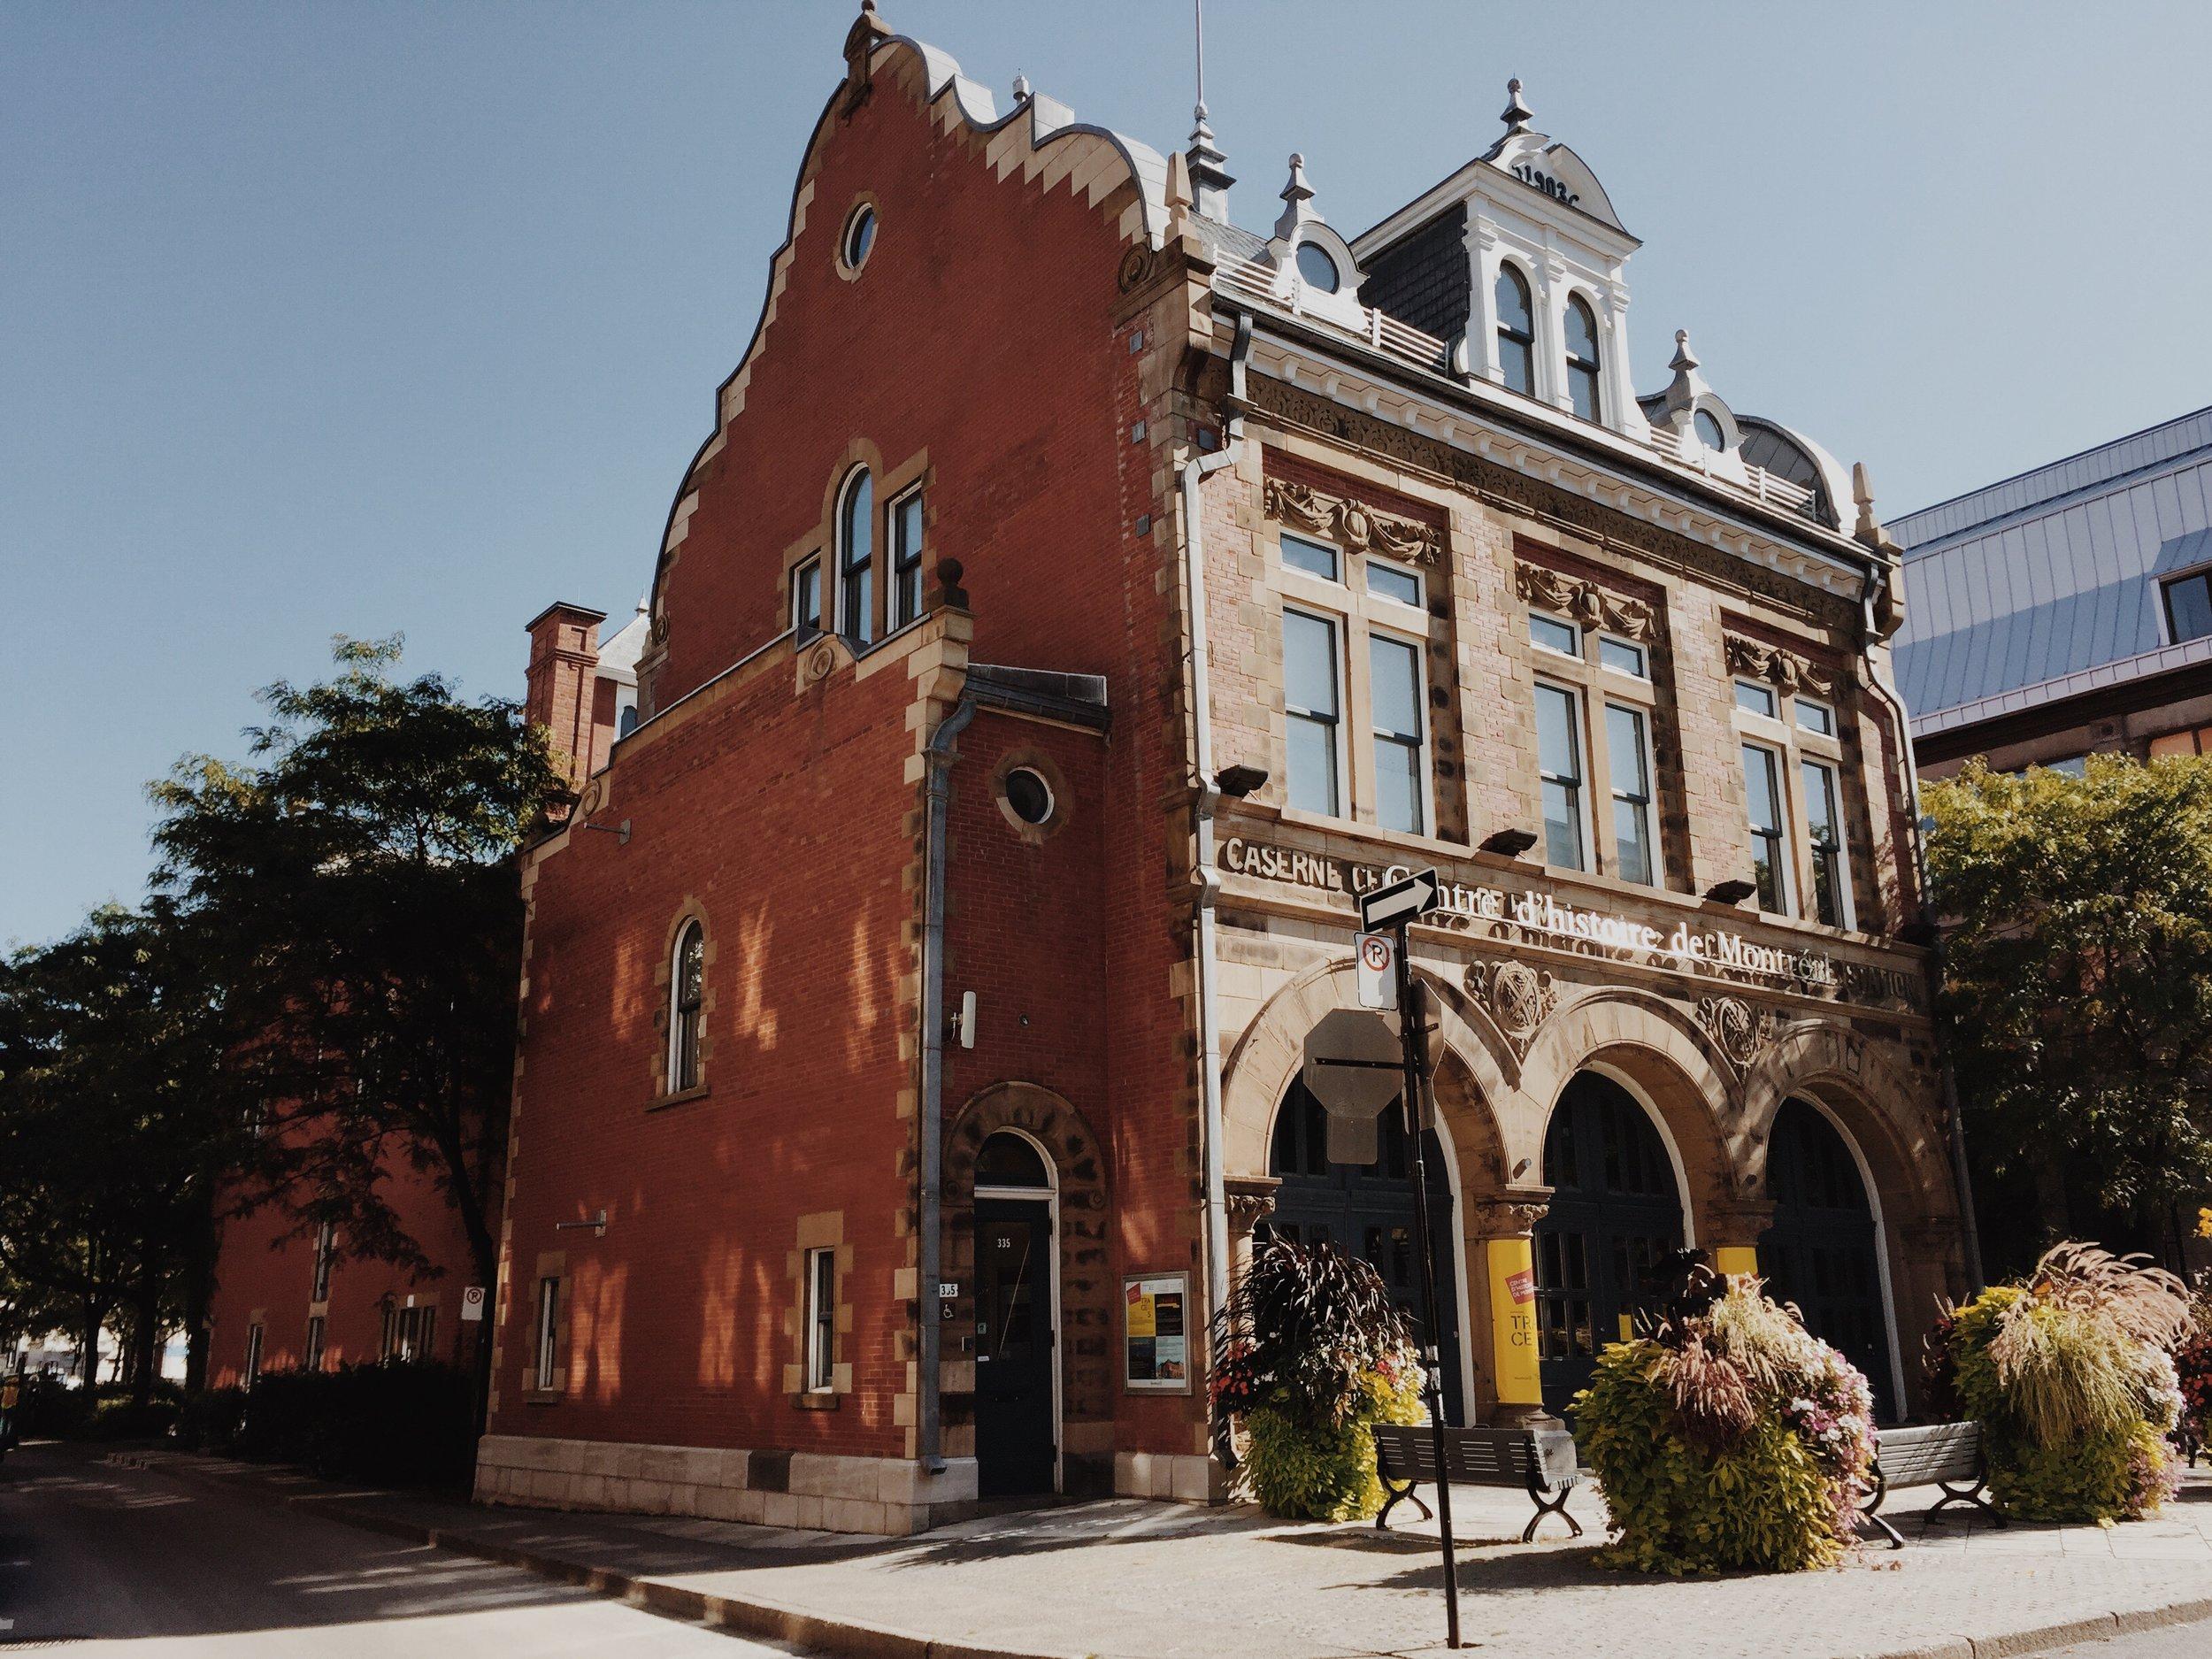 Centre d'historie de Montreal via Lora Weaver Mysteries by Katy Leen